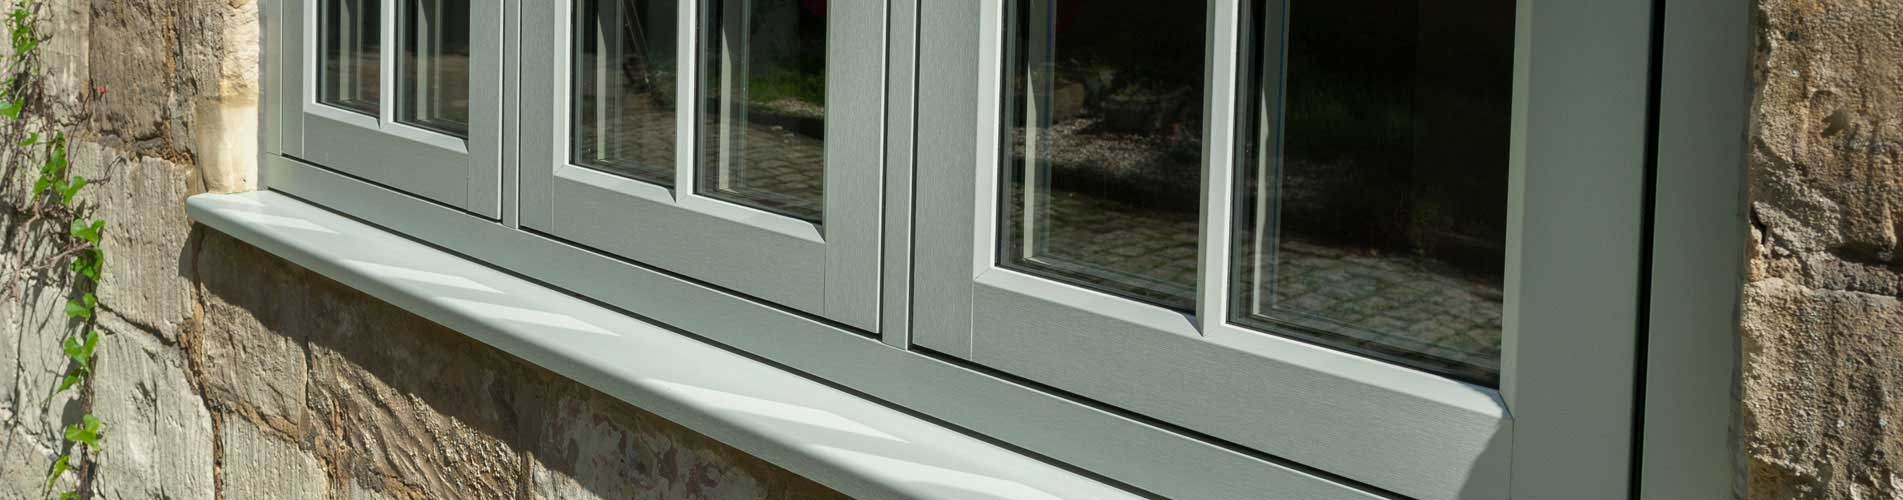 Flush Casement Windows, Waterlooville